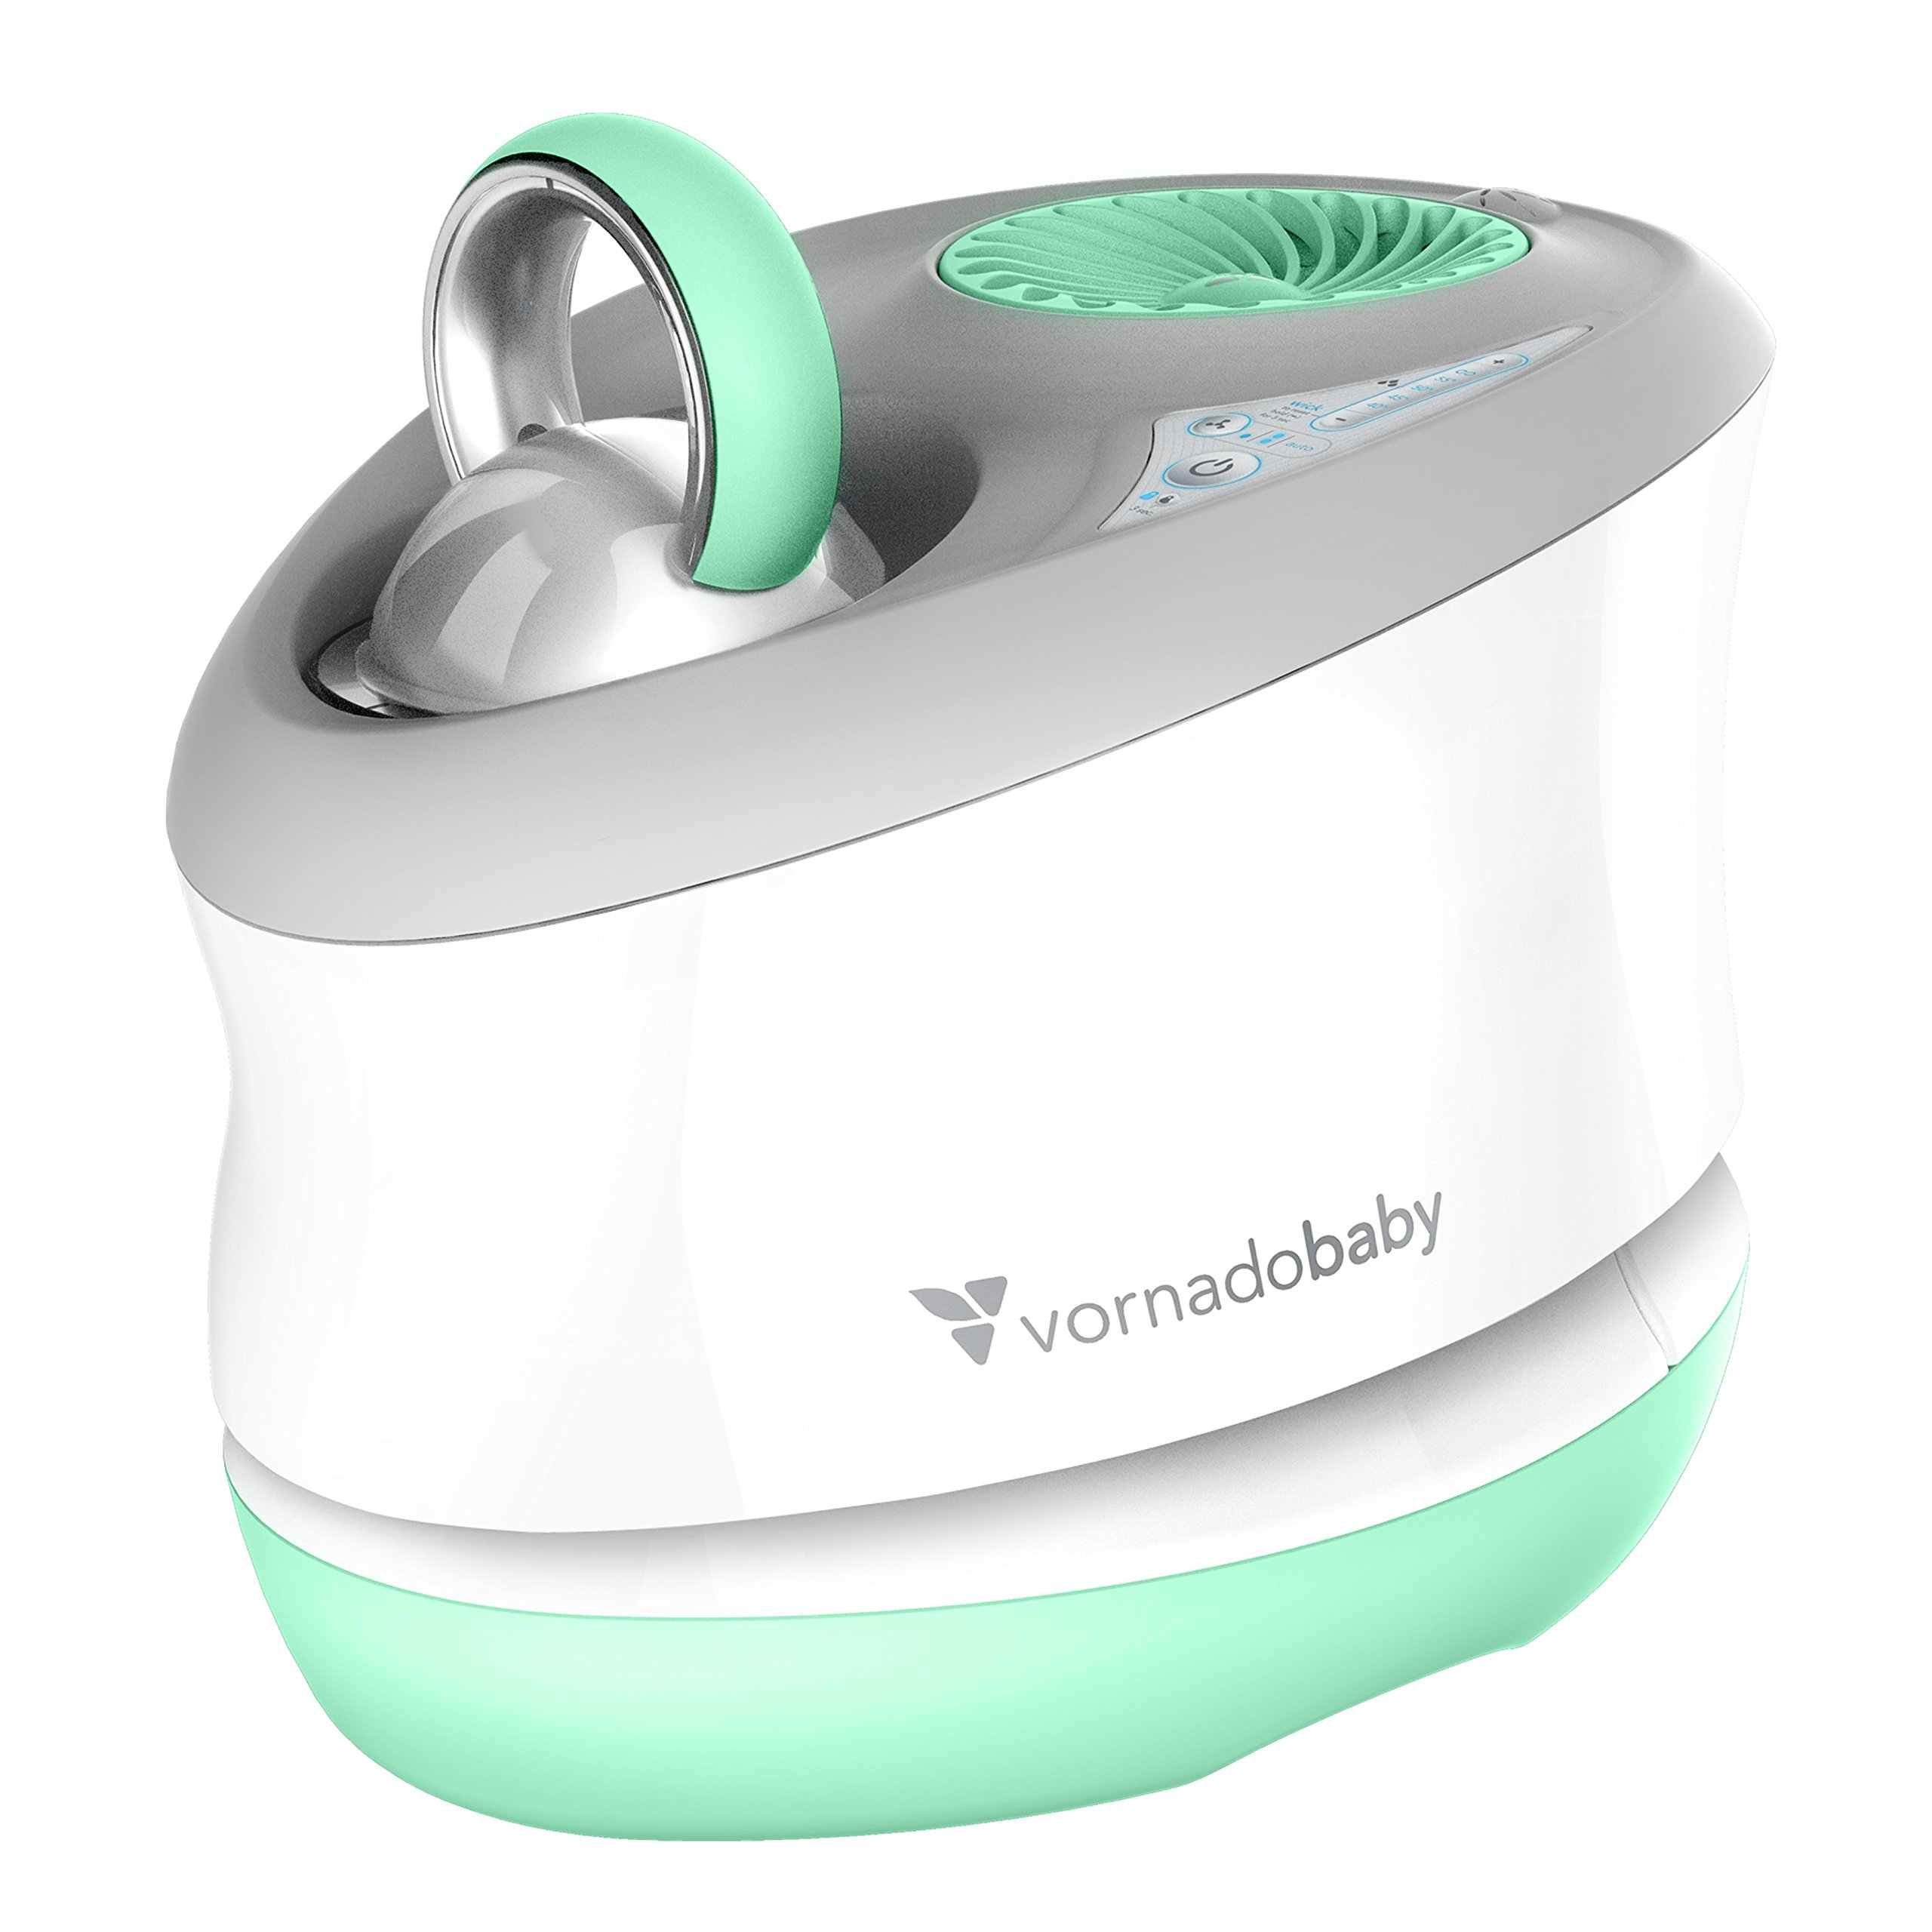 Vornadobaby Huey Nursery Evaporative Humidifier by Vornadobaby